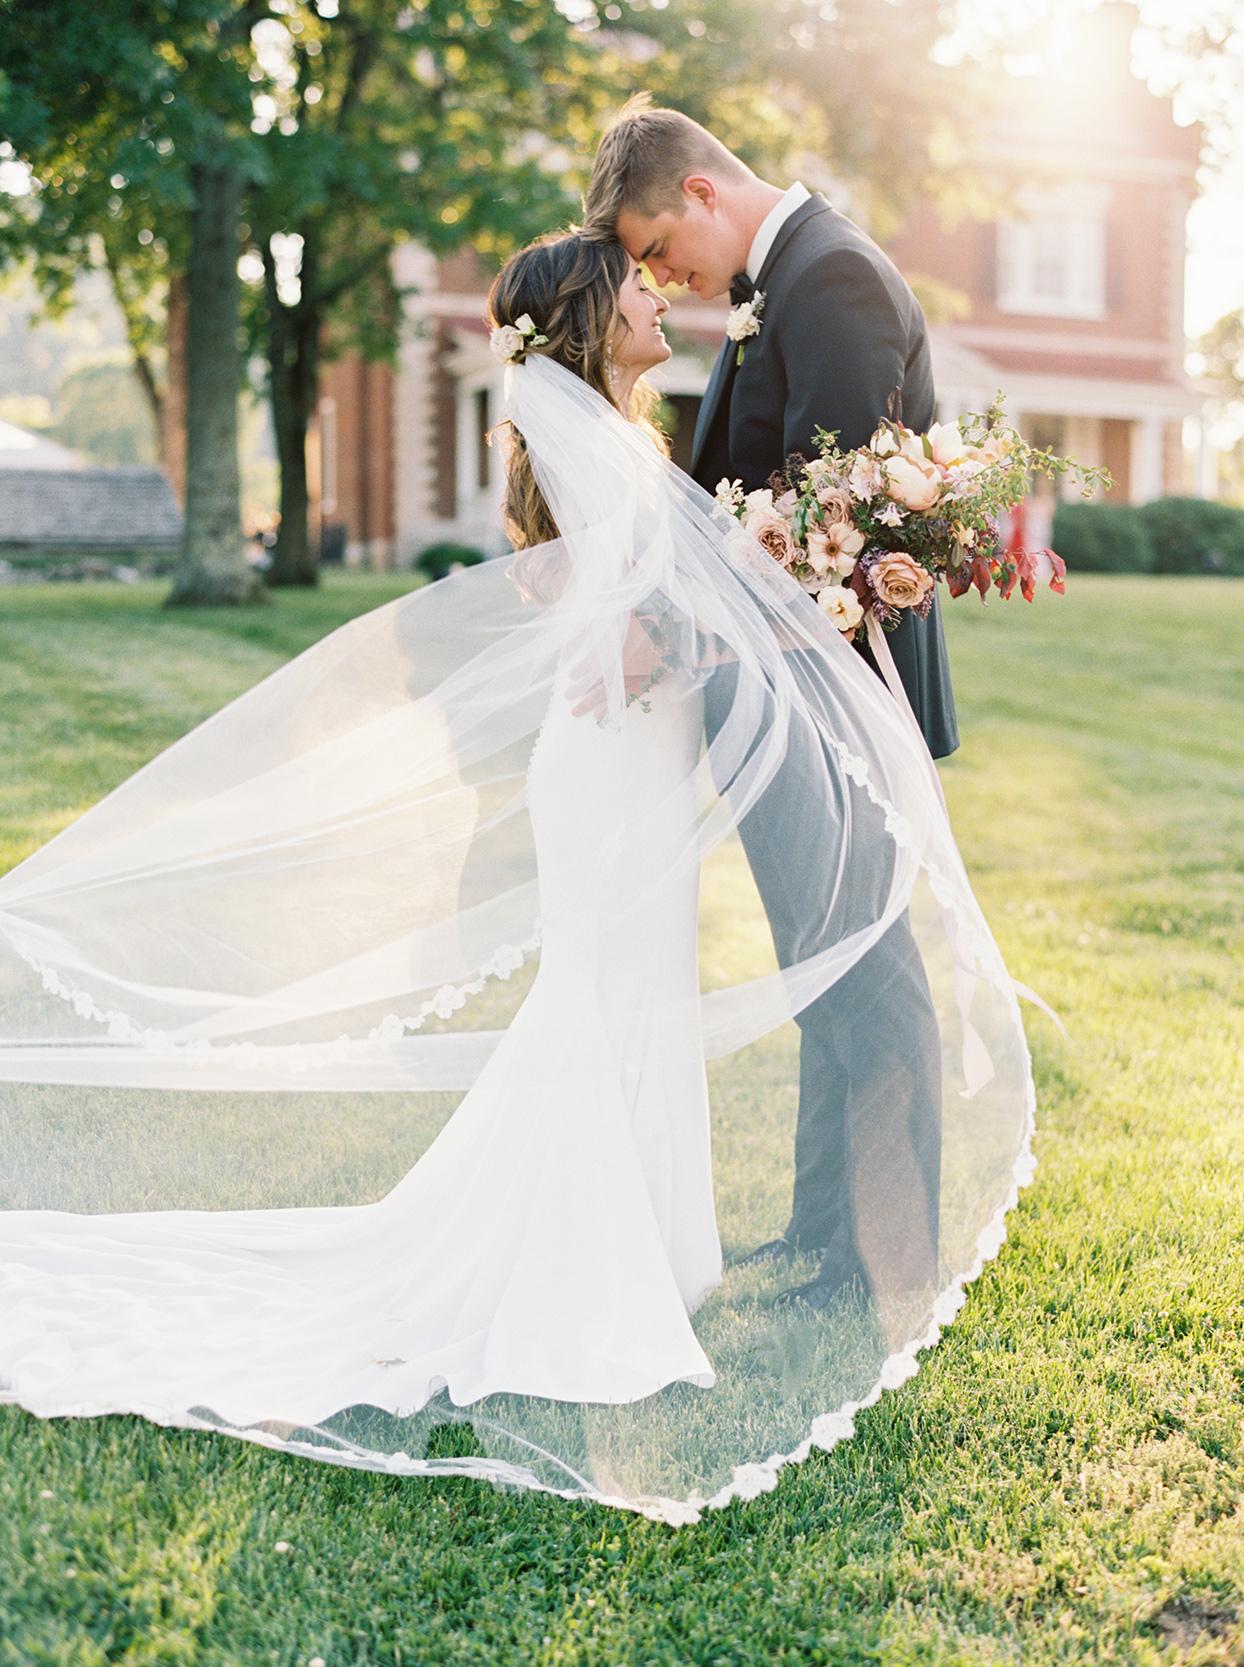 julia doug wedding couple veil blowing in wind